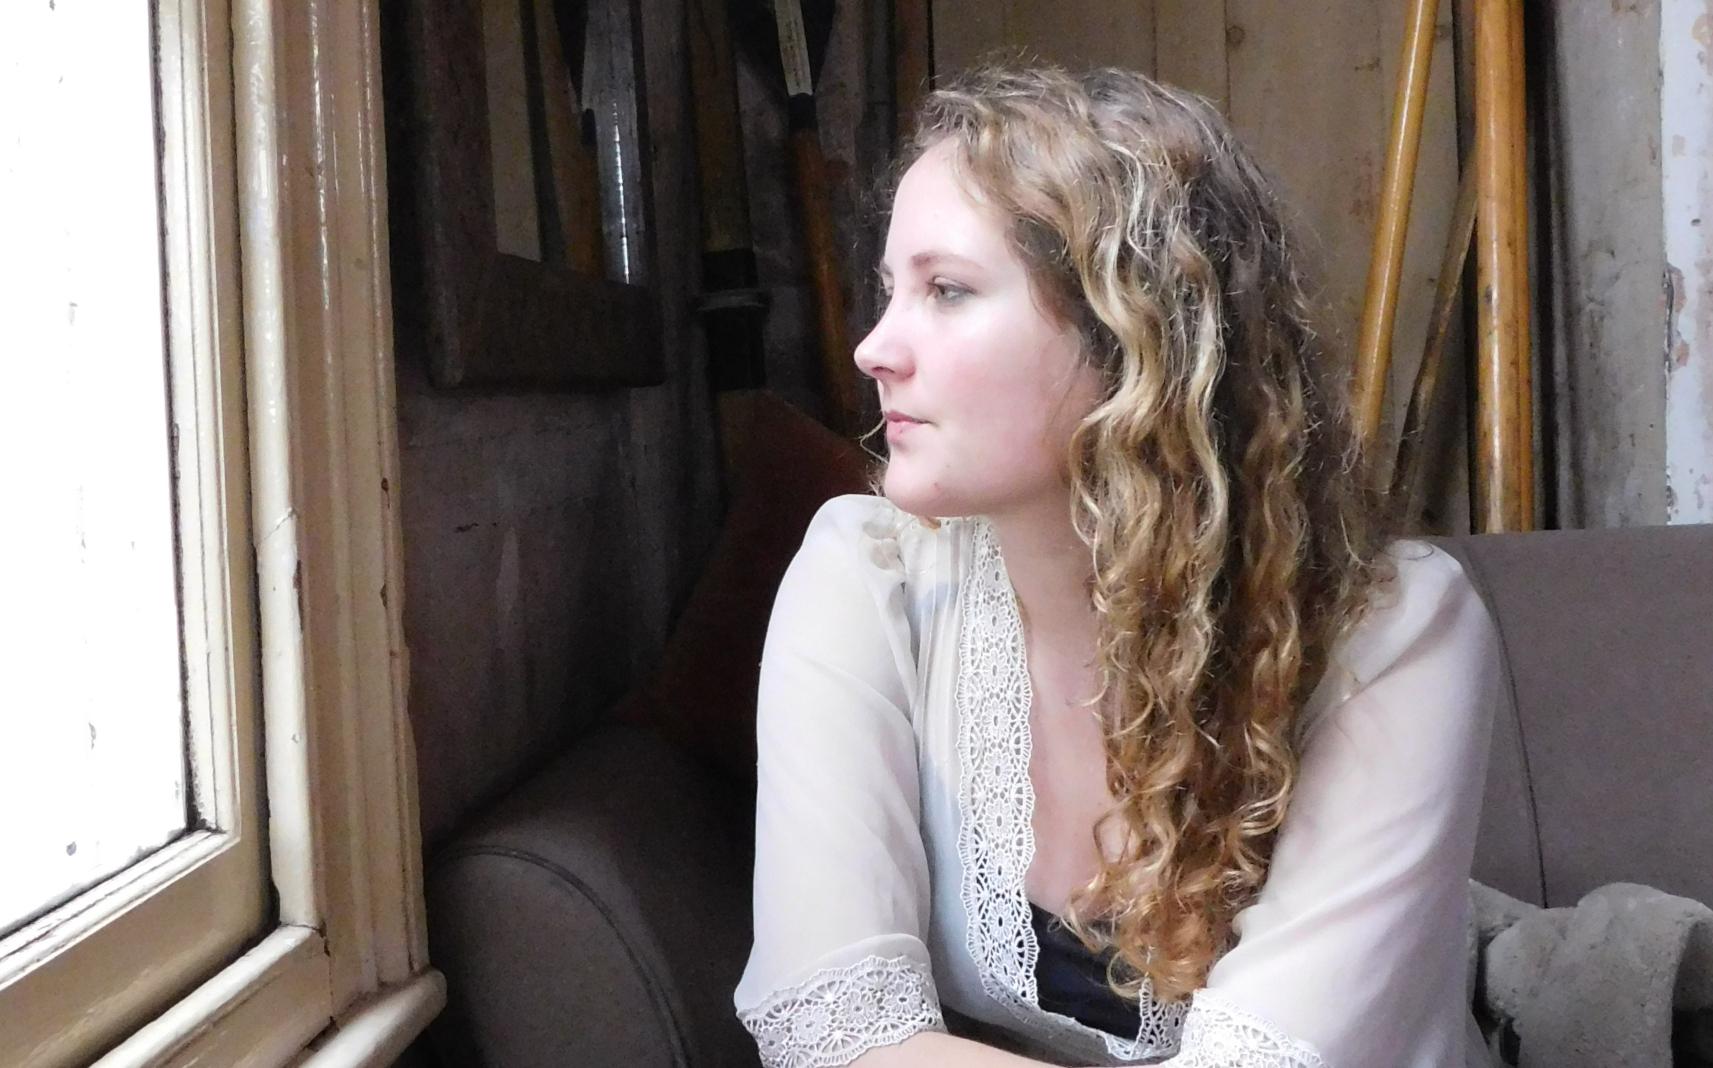 Daisy Johnson: Συνέντευξη με μια από τις πιο ανερχόμενες συγγραφείς της ευρωπαϊκής λογοτεχνίας